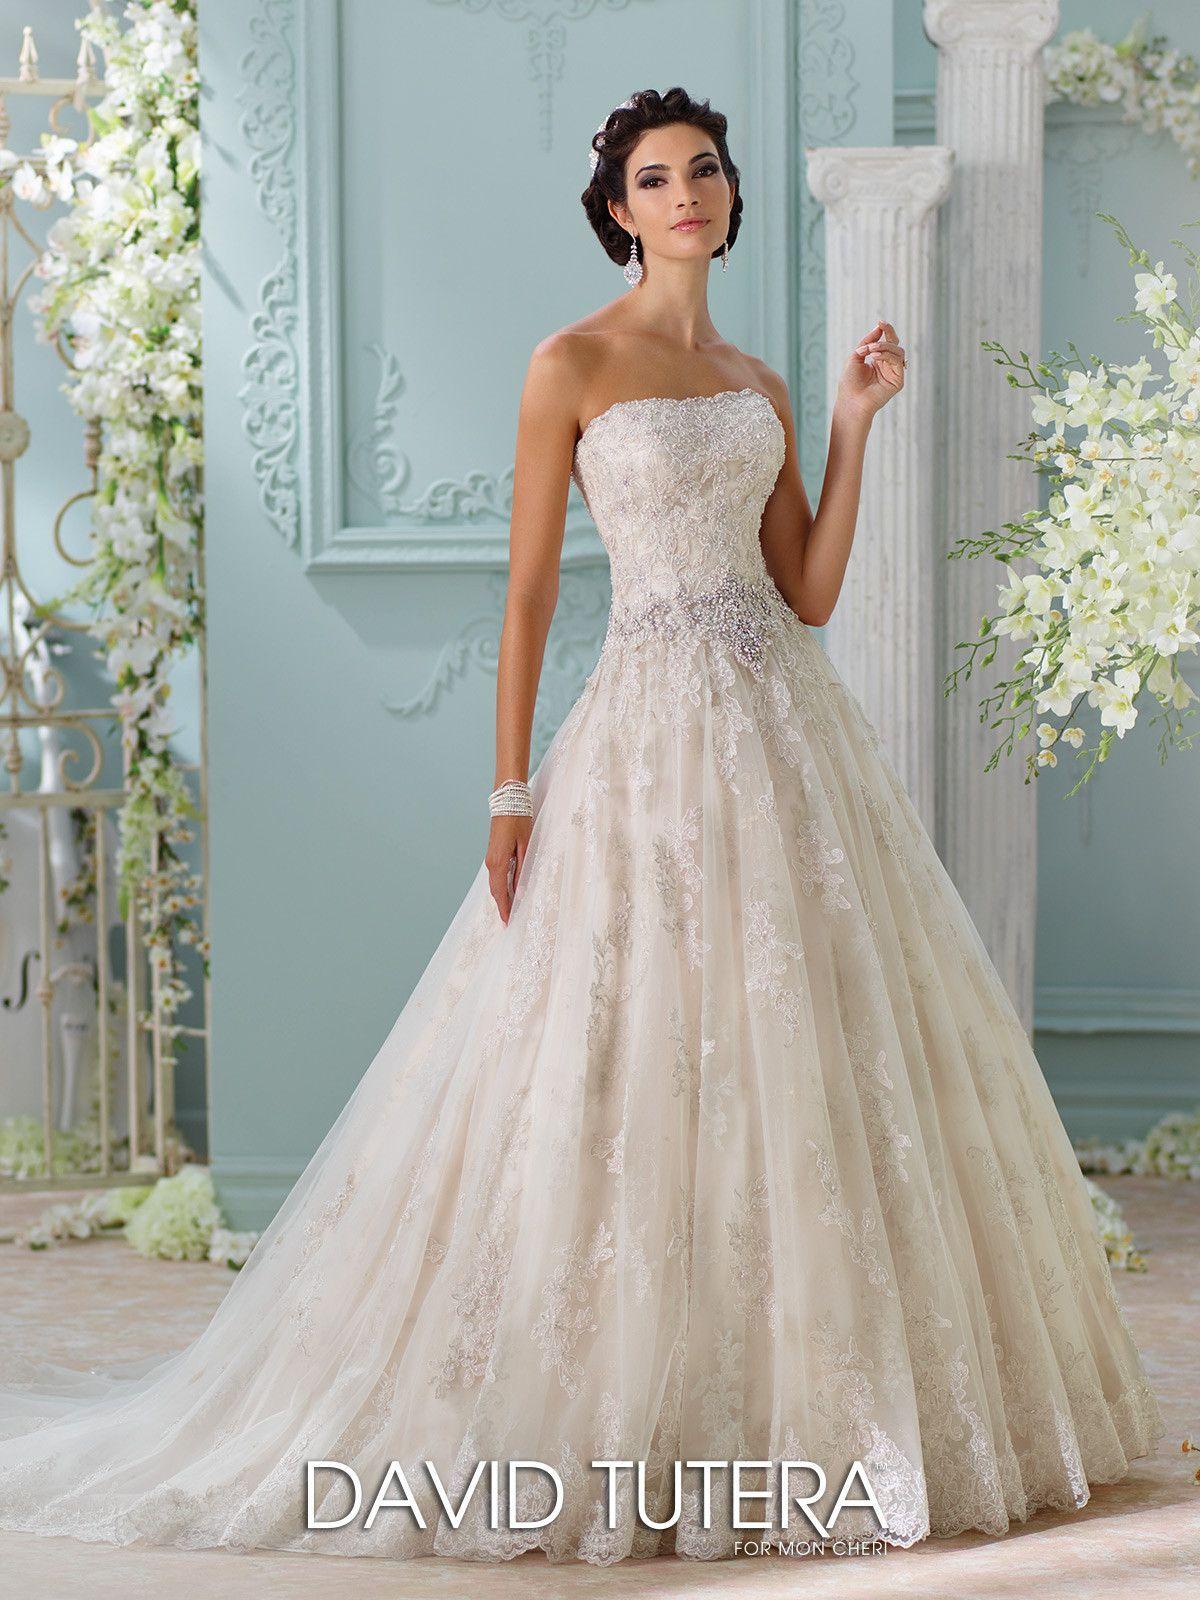 Blog | David tutera, Bridal gowns and Couture